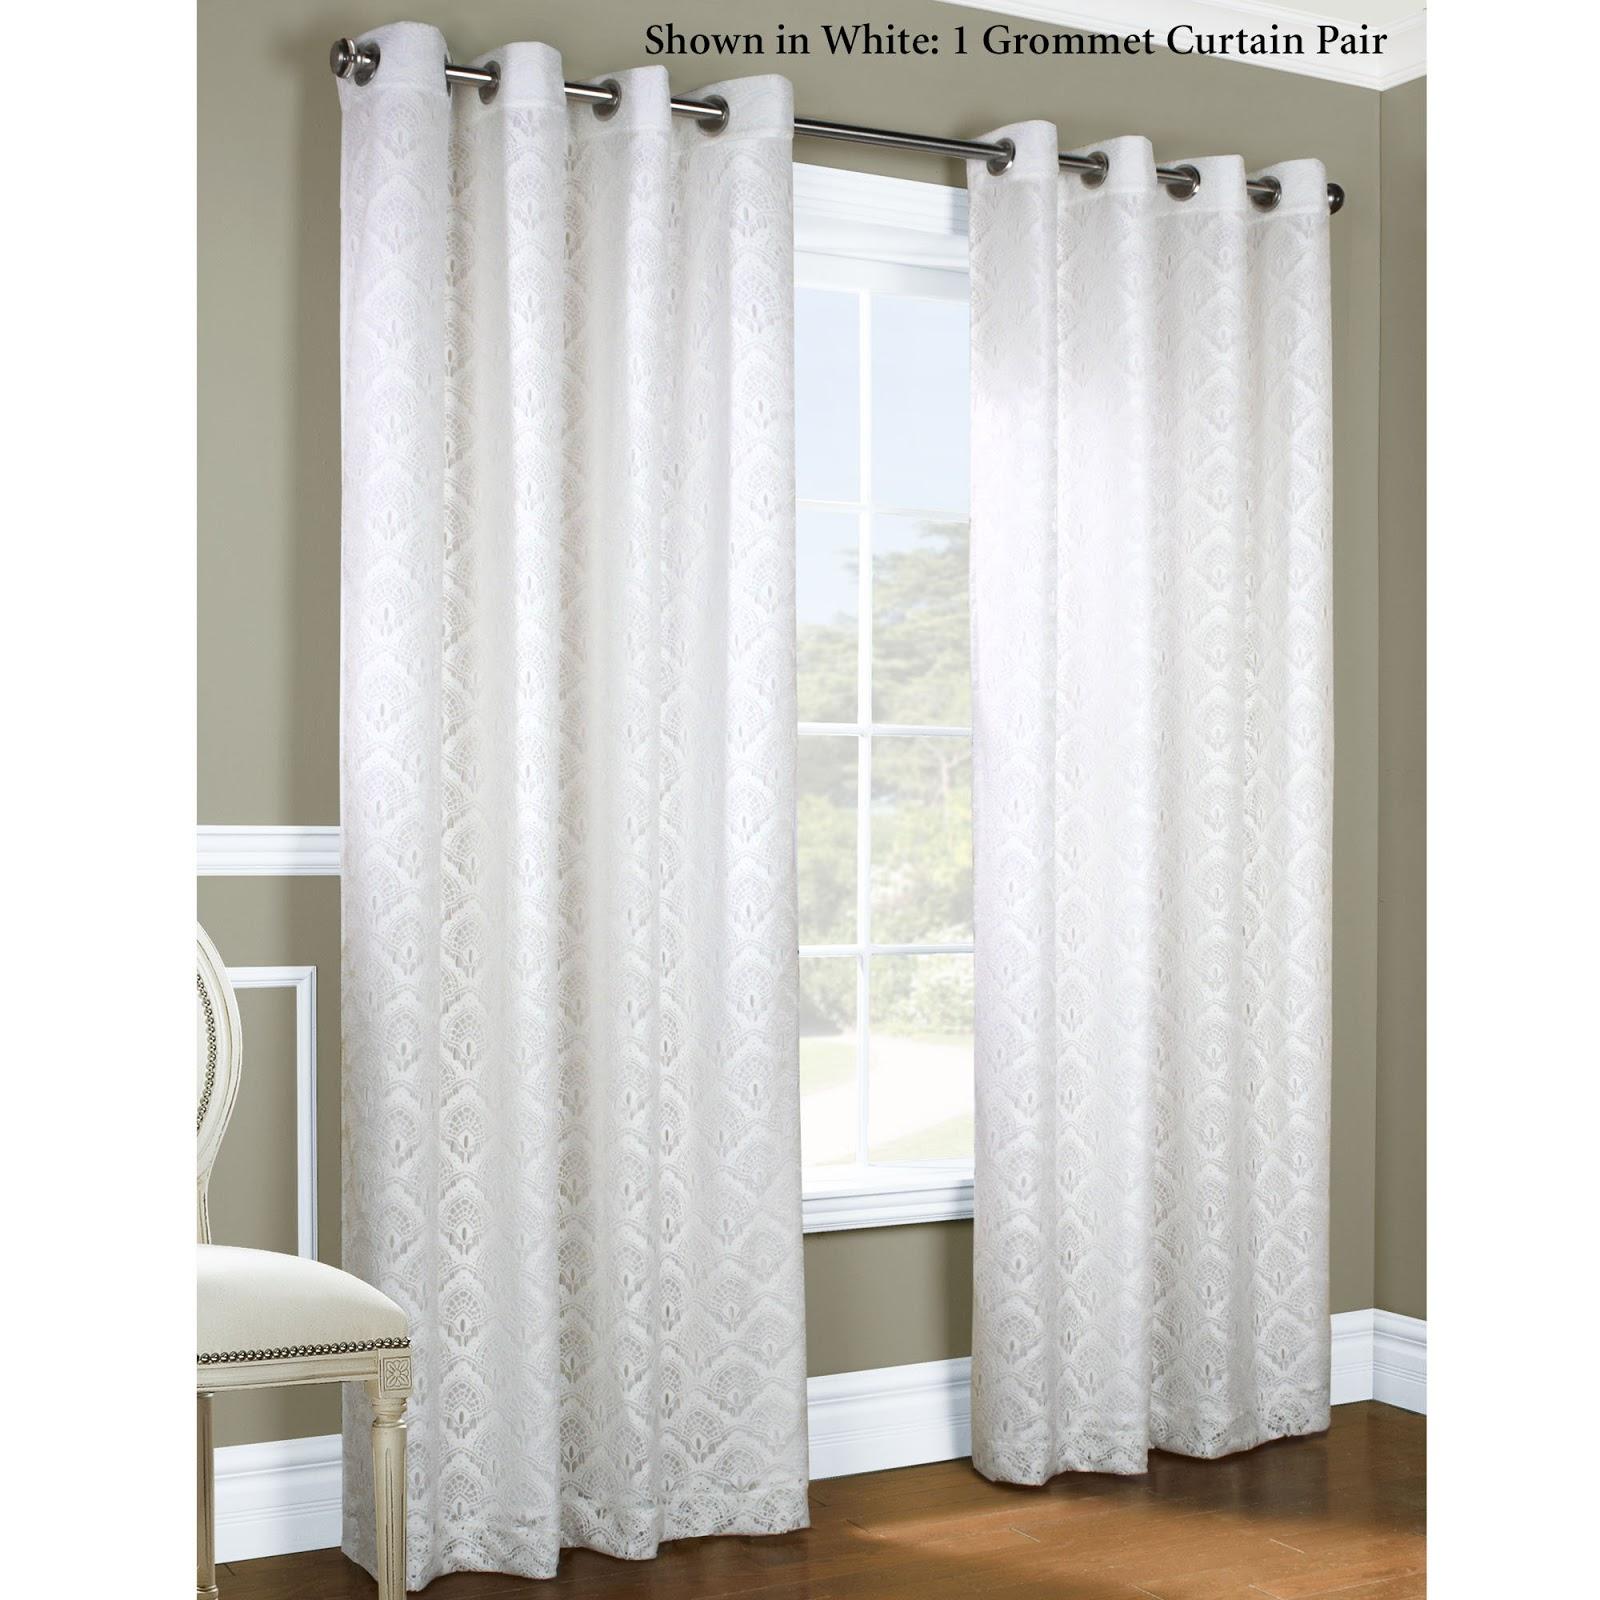 Curtain In Bathroom Bedroom Doorway Living Room Photo